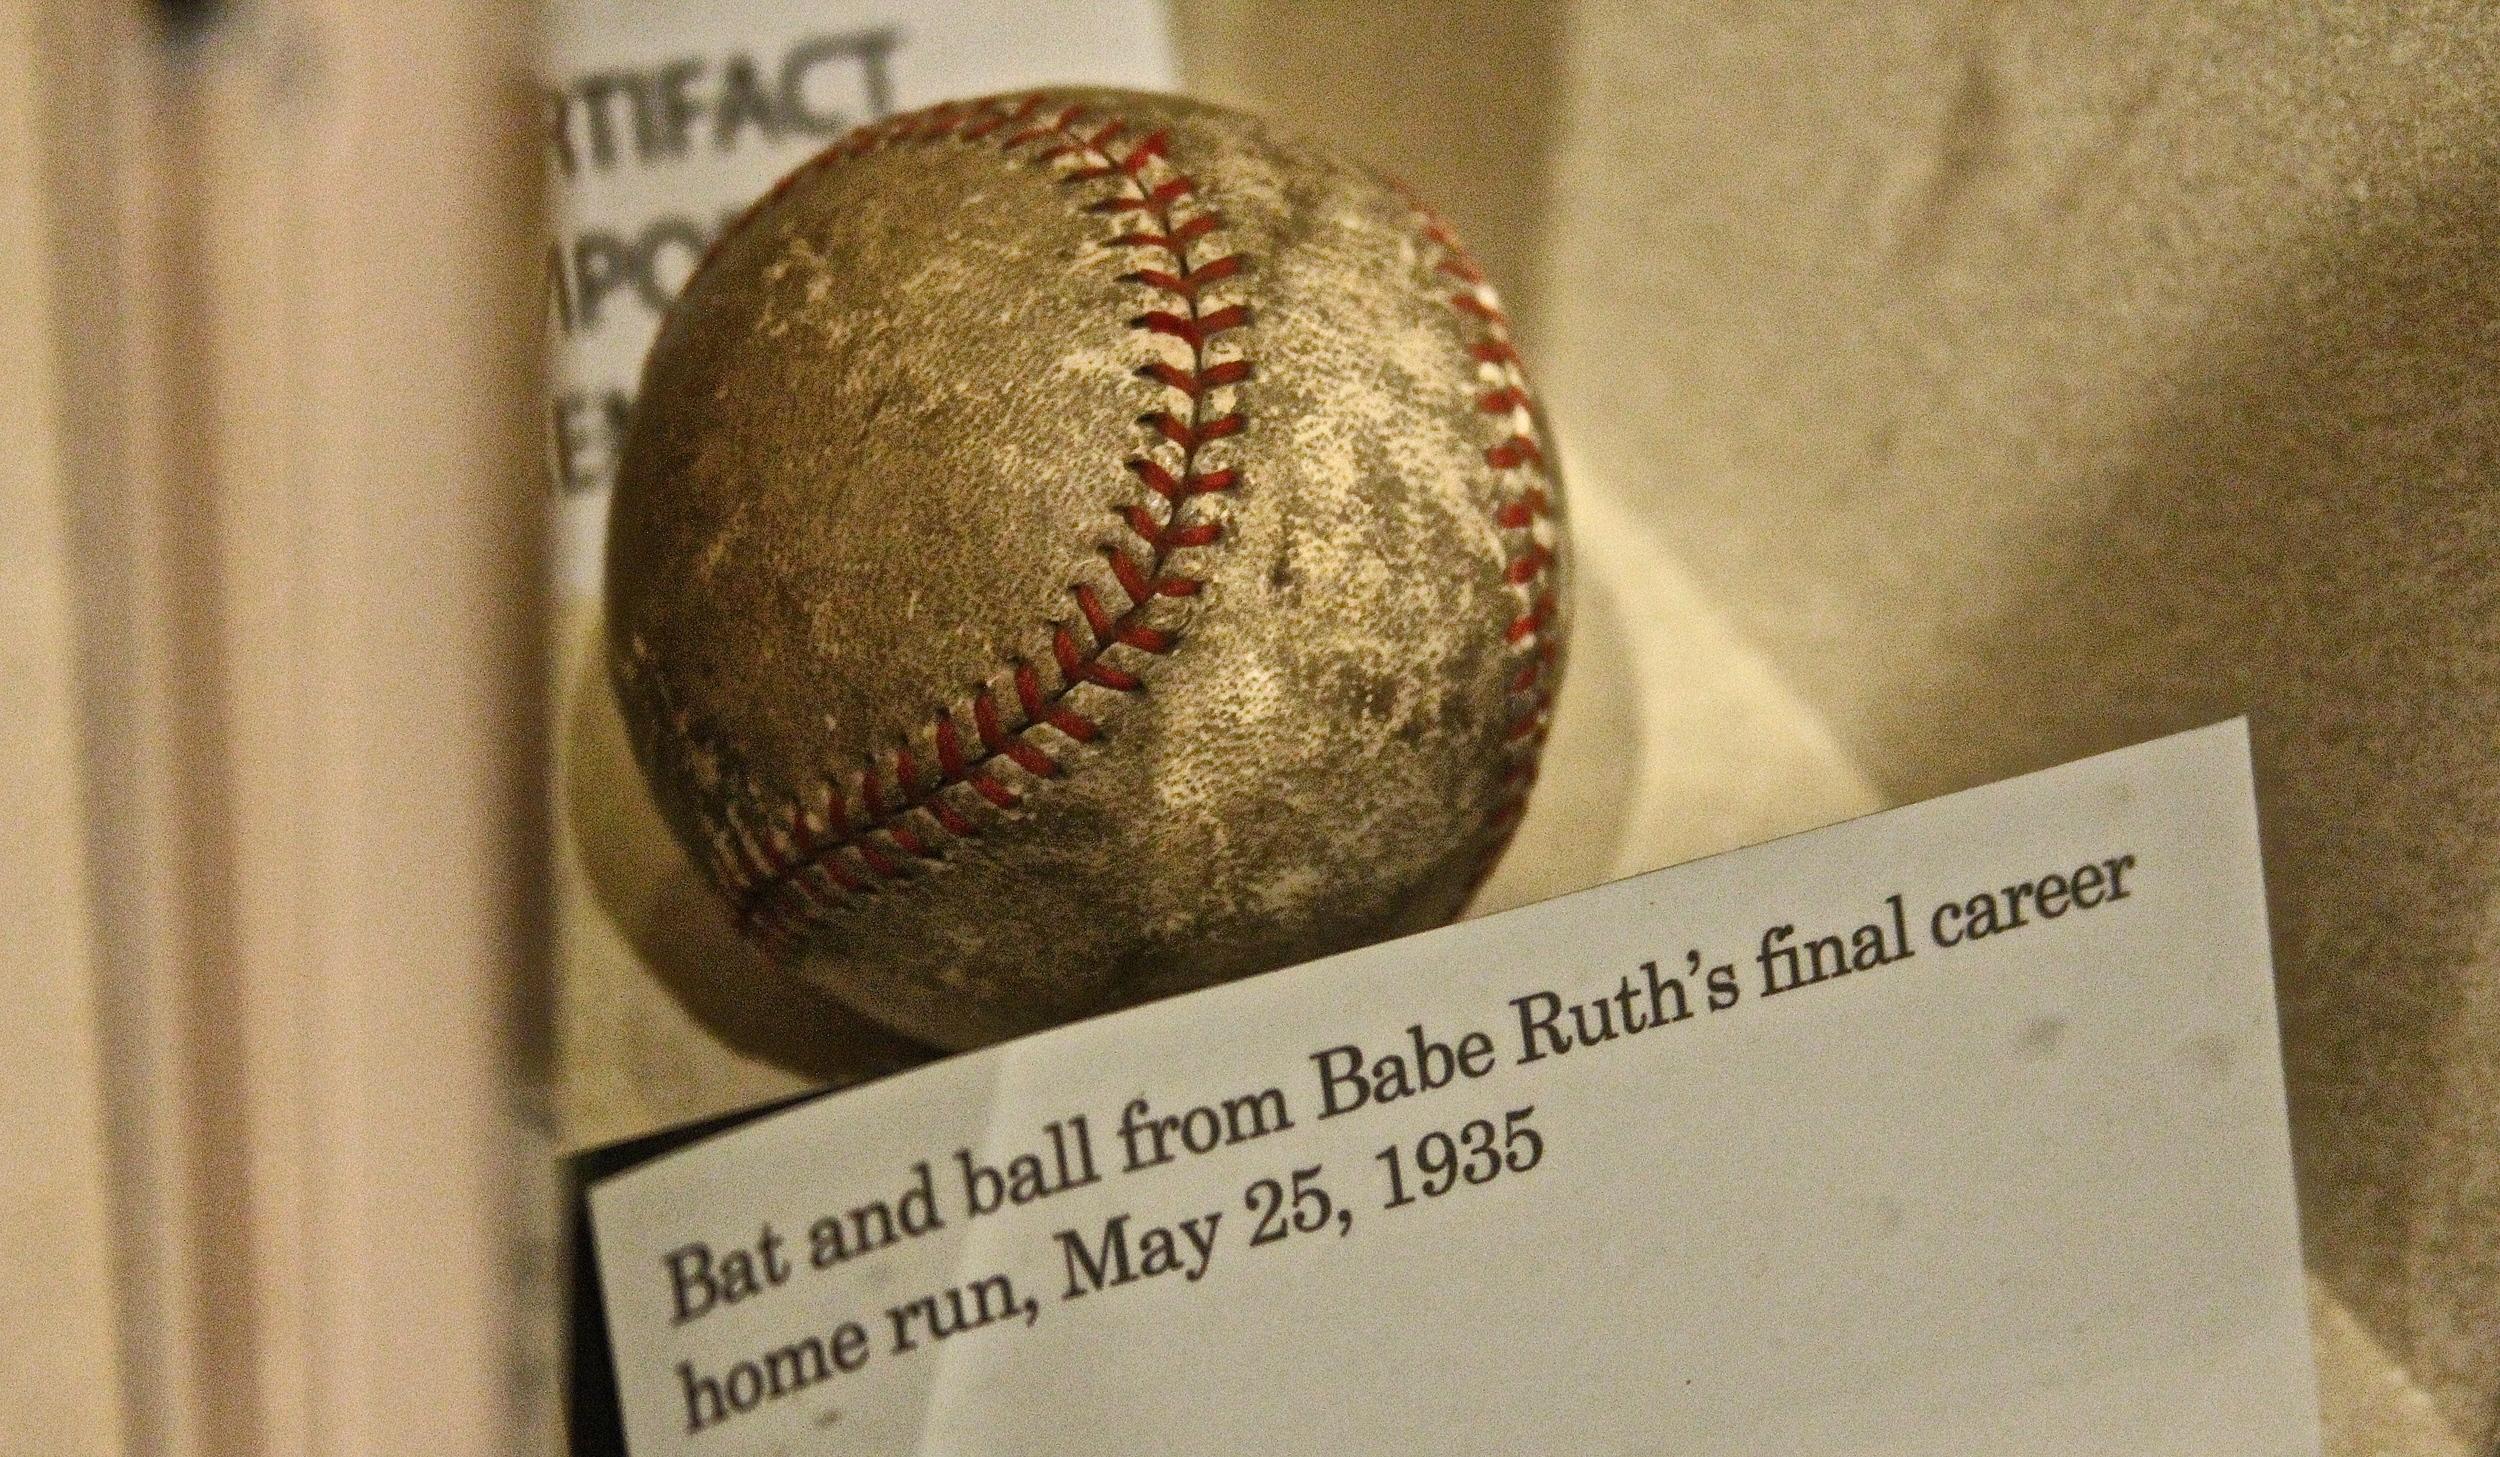 Babe Ruth 714